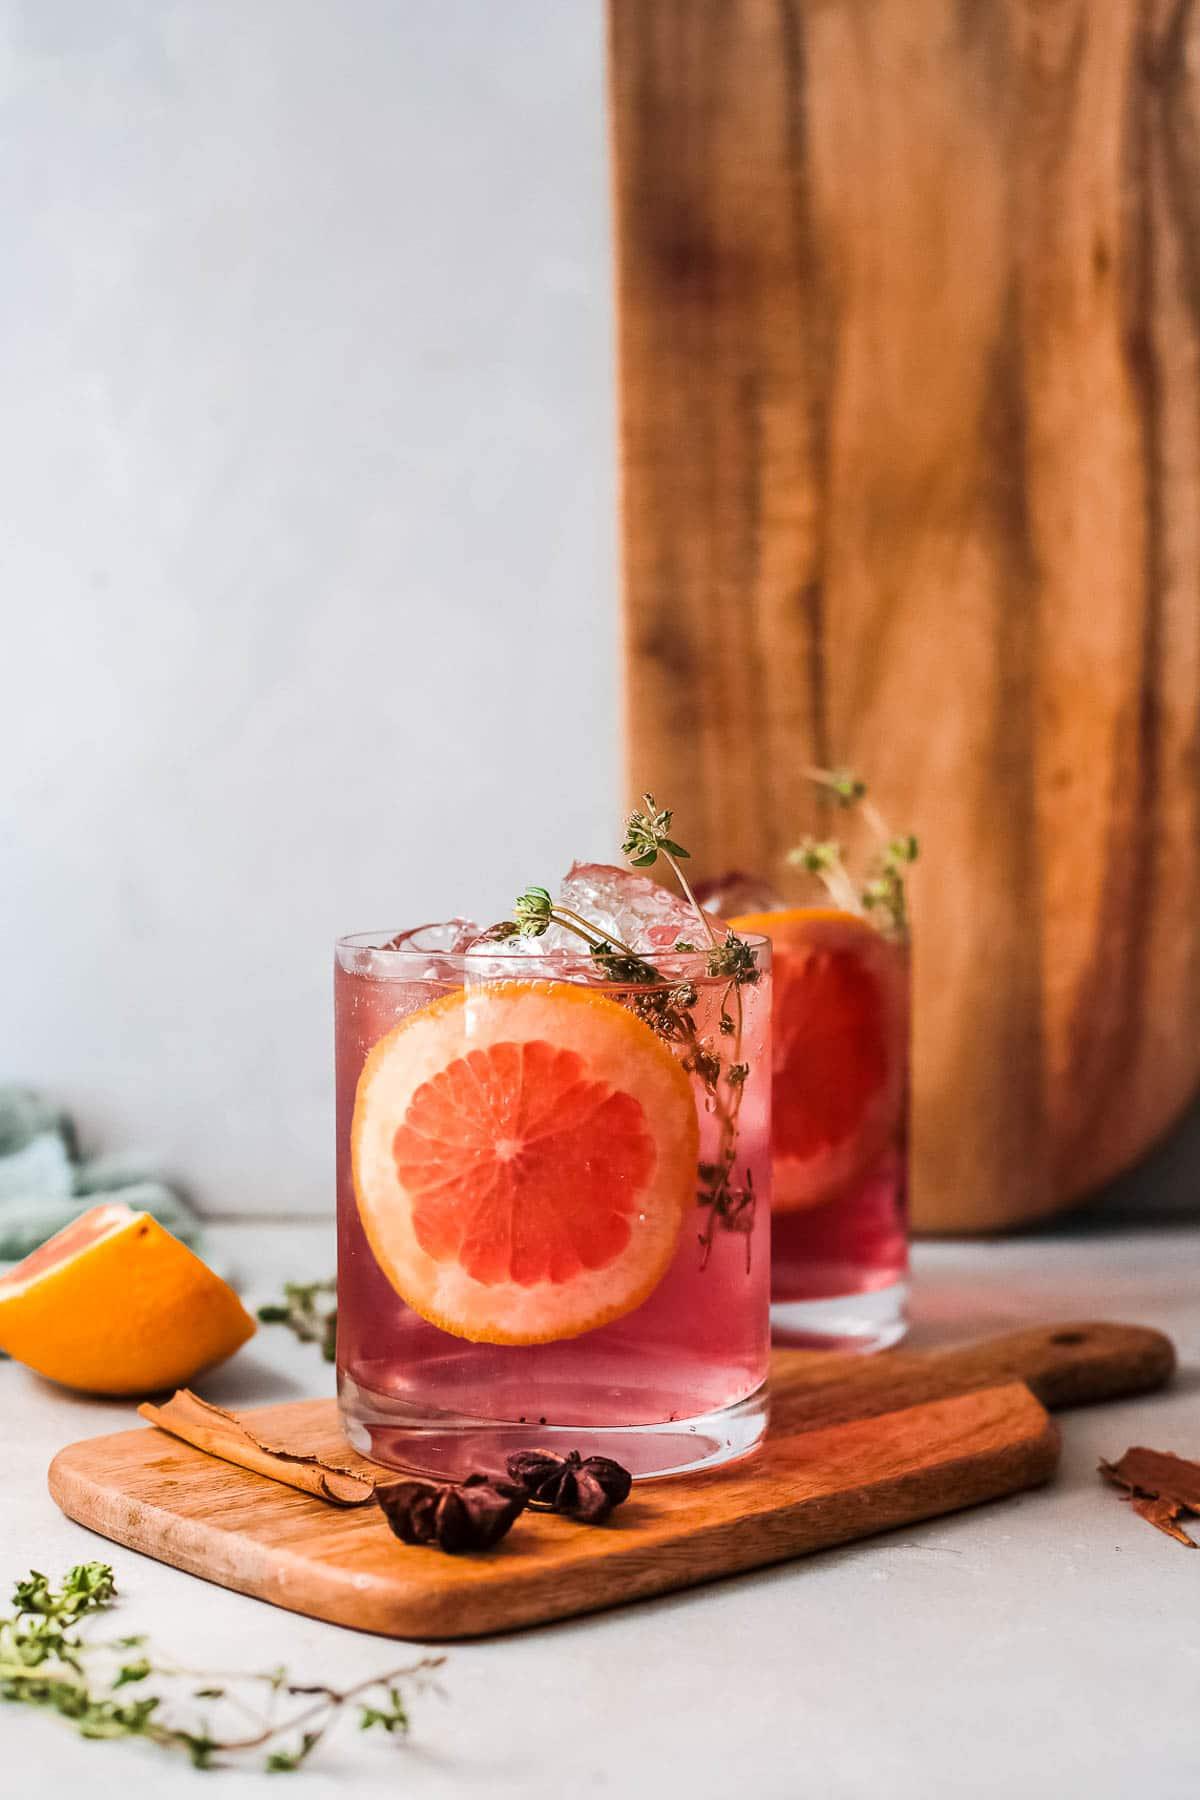 poinsettia drink with orange slice